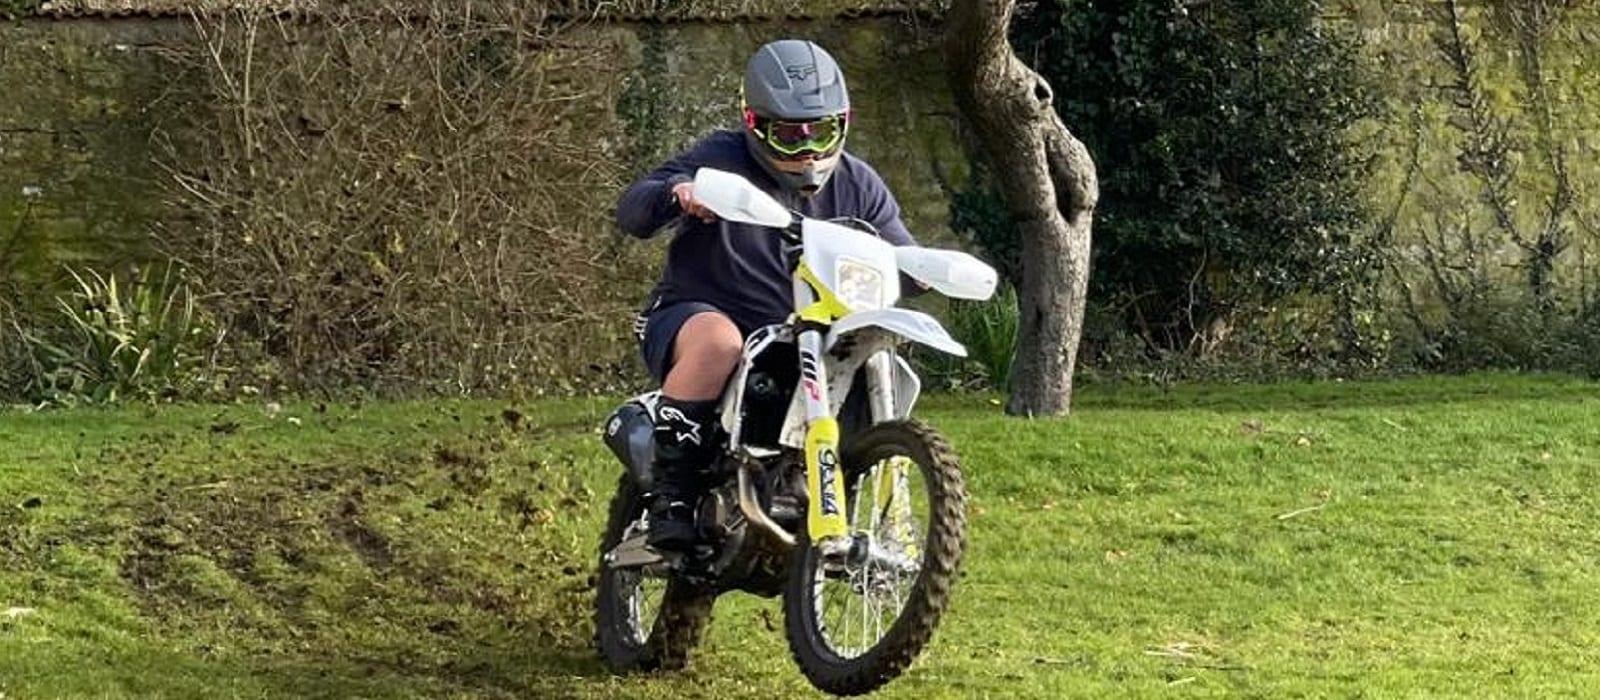 NFU Mutual - responsible business report - Ben Amis on motorbike (003)